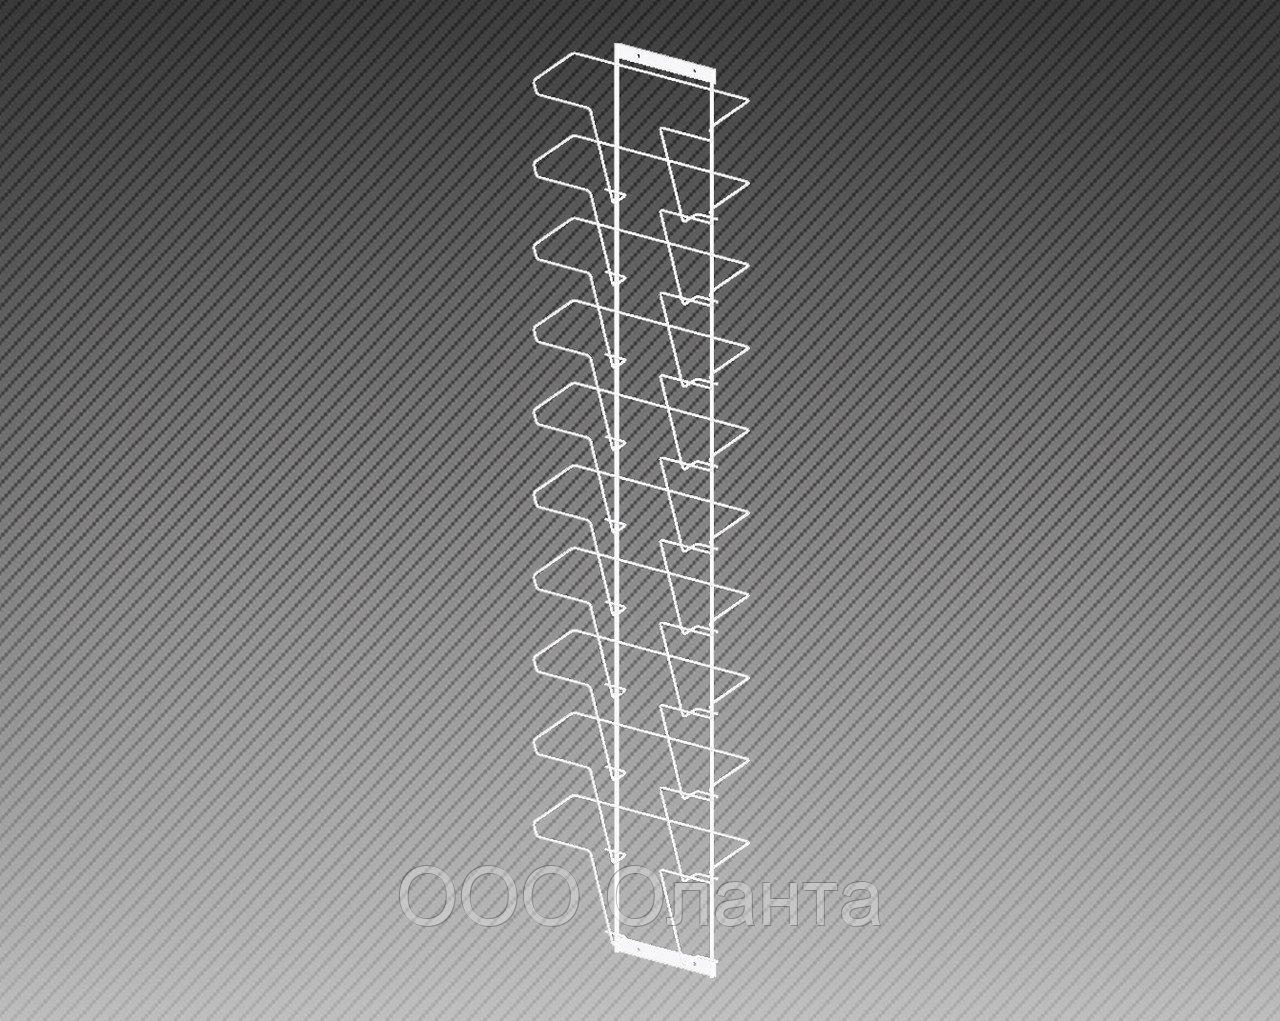 Полоса настенная для прайс-листов на 10 карманов формат А4 арт. СБС3-10Г